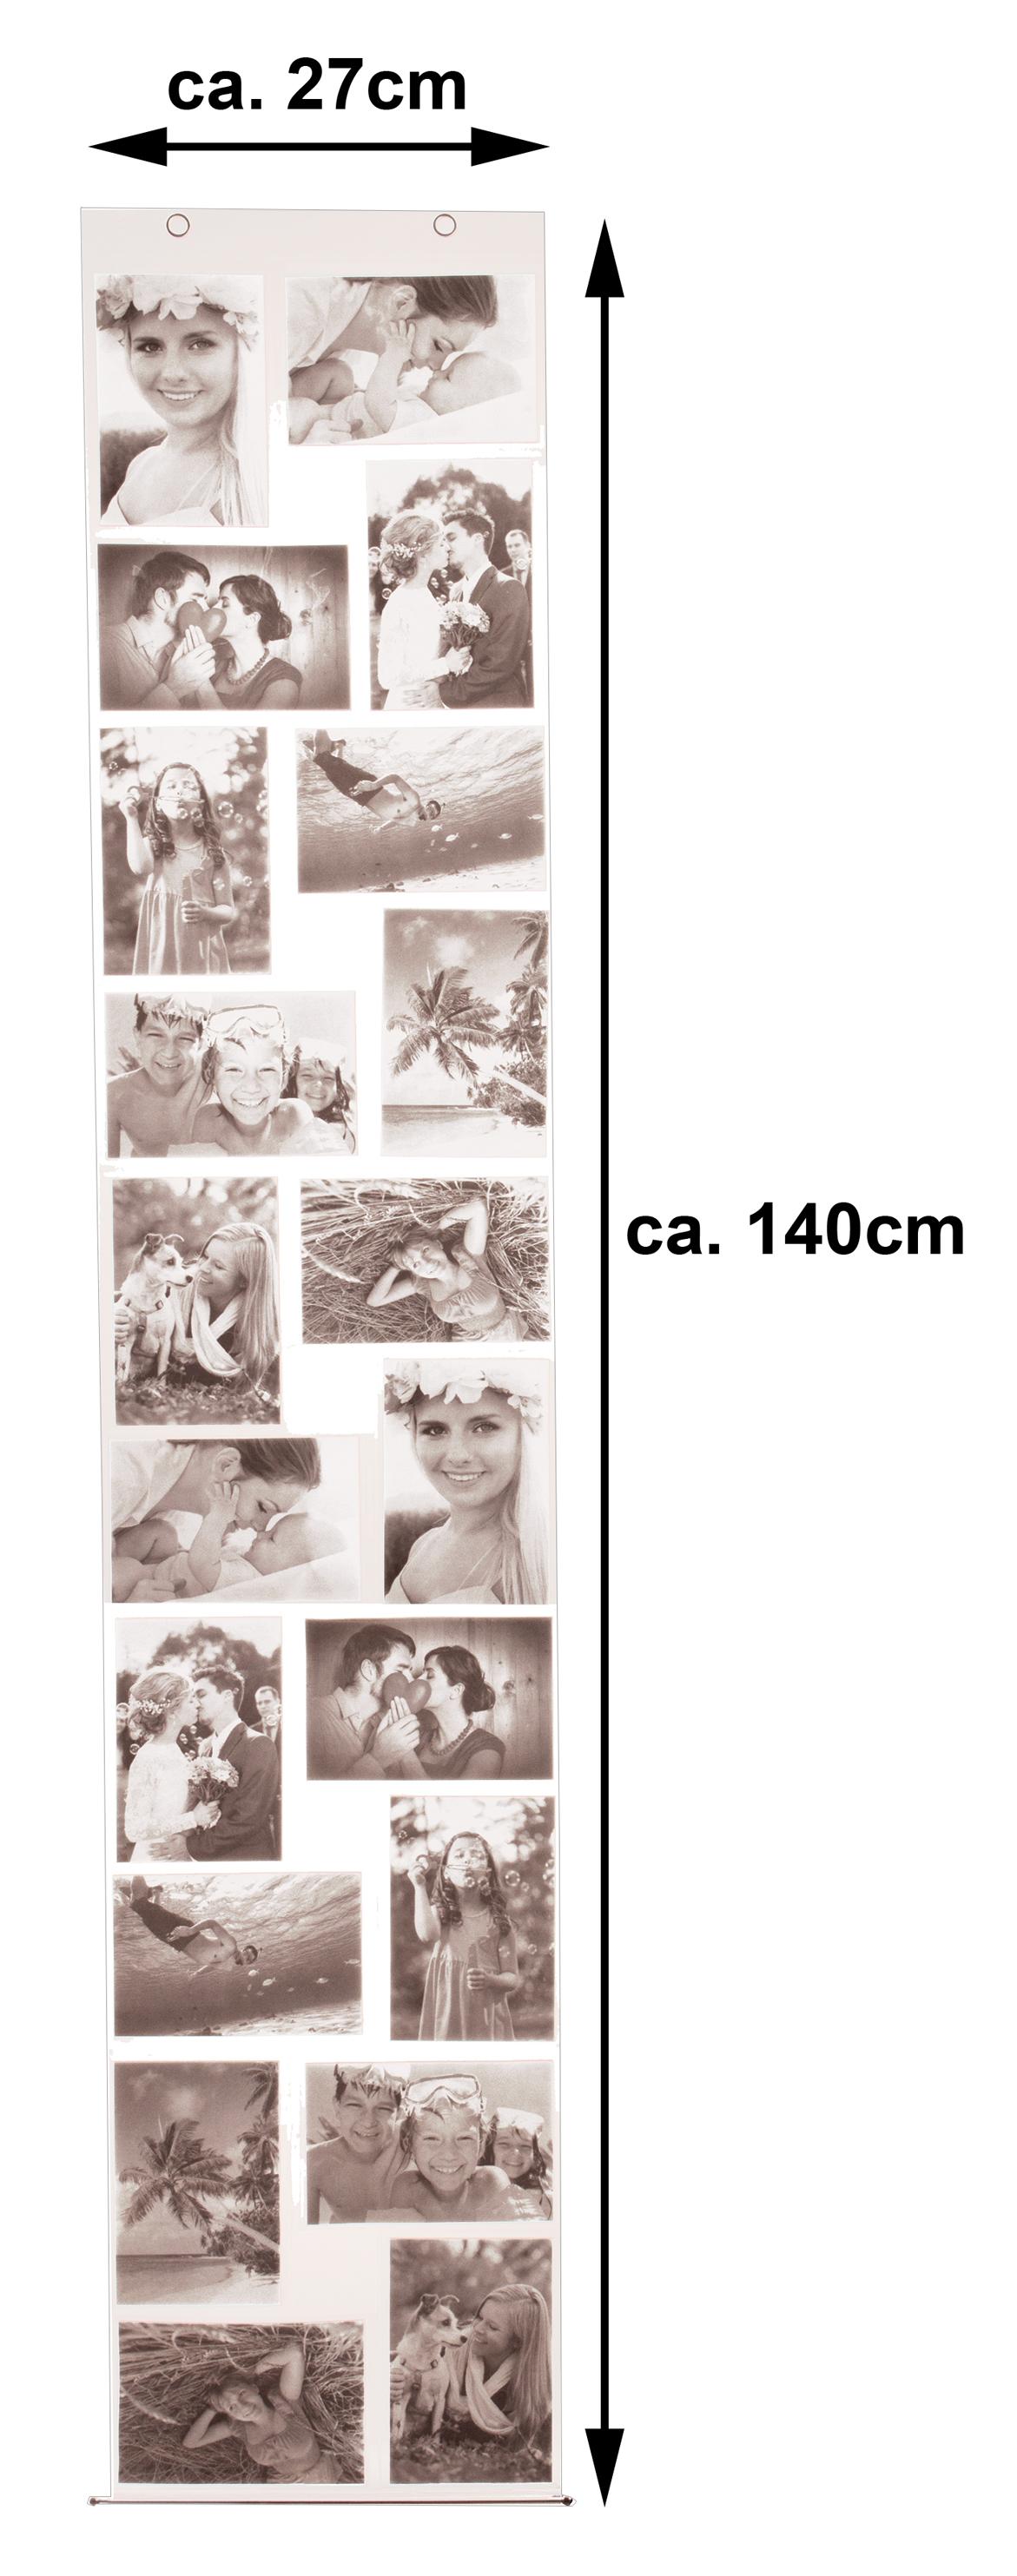 Fotowand C6 für 20 Fotos Fotovorhang Bilderrahmen Fotogalerie Photo Vorhang